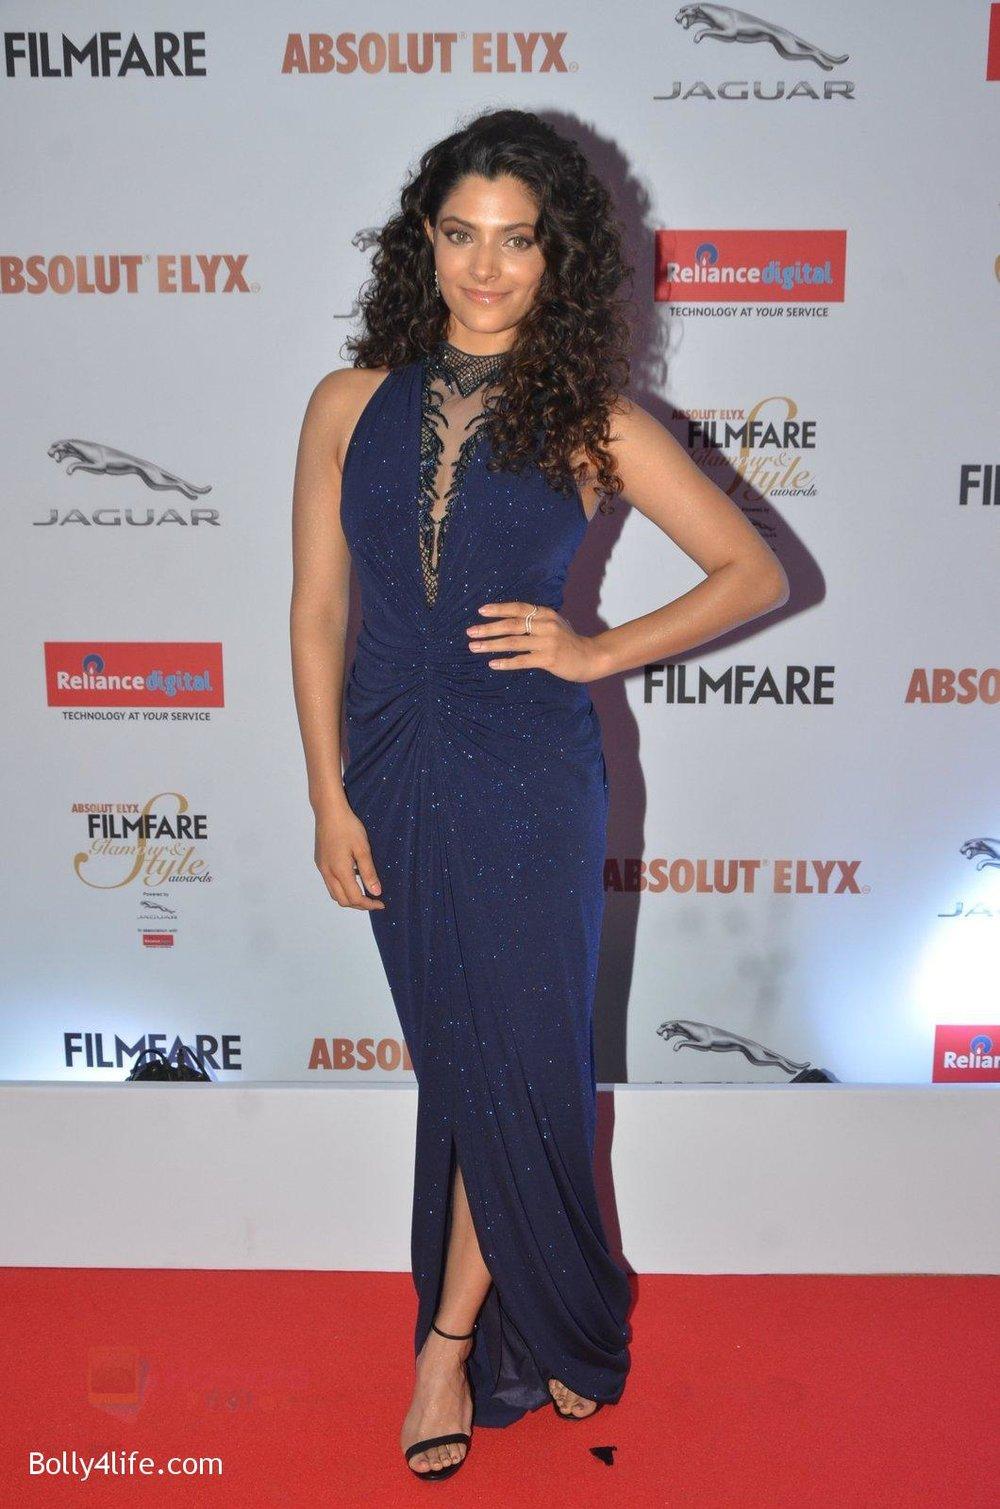 Saiyami-Kher-at-Filmfare-Glamour-Style-Awards-2016-in-Mumbai-on-15th-Oct-2016-1289.jpg